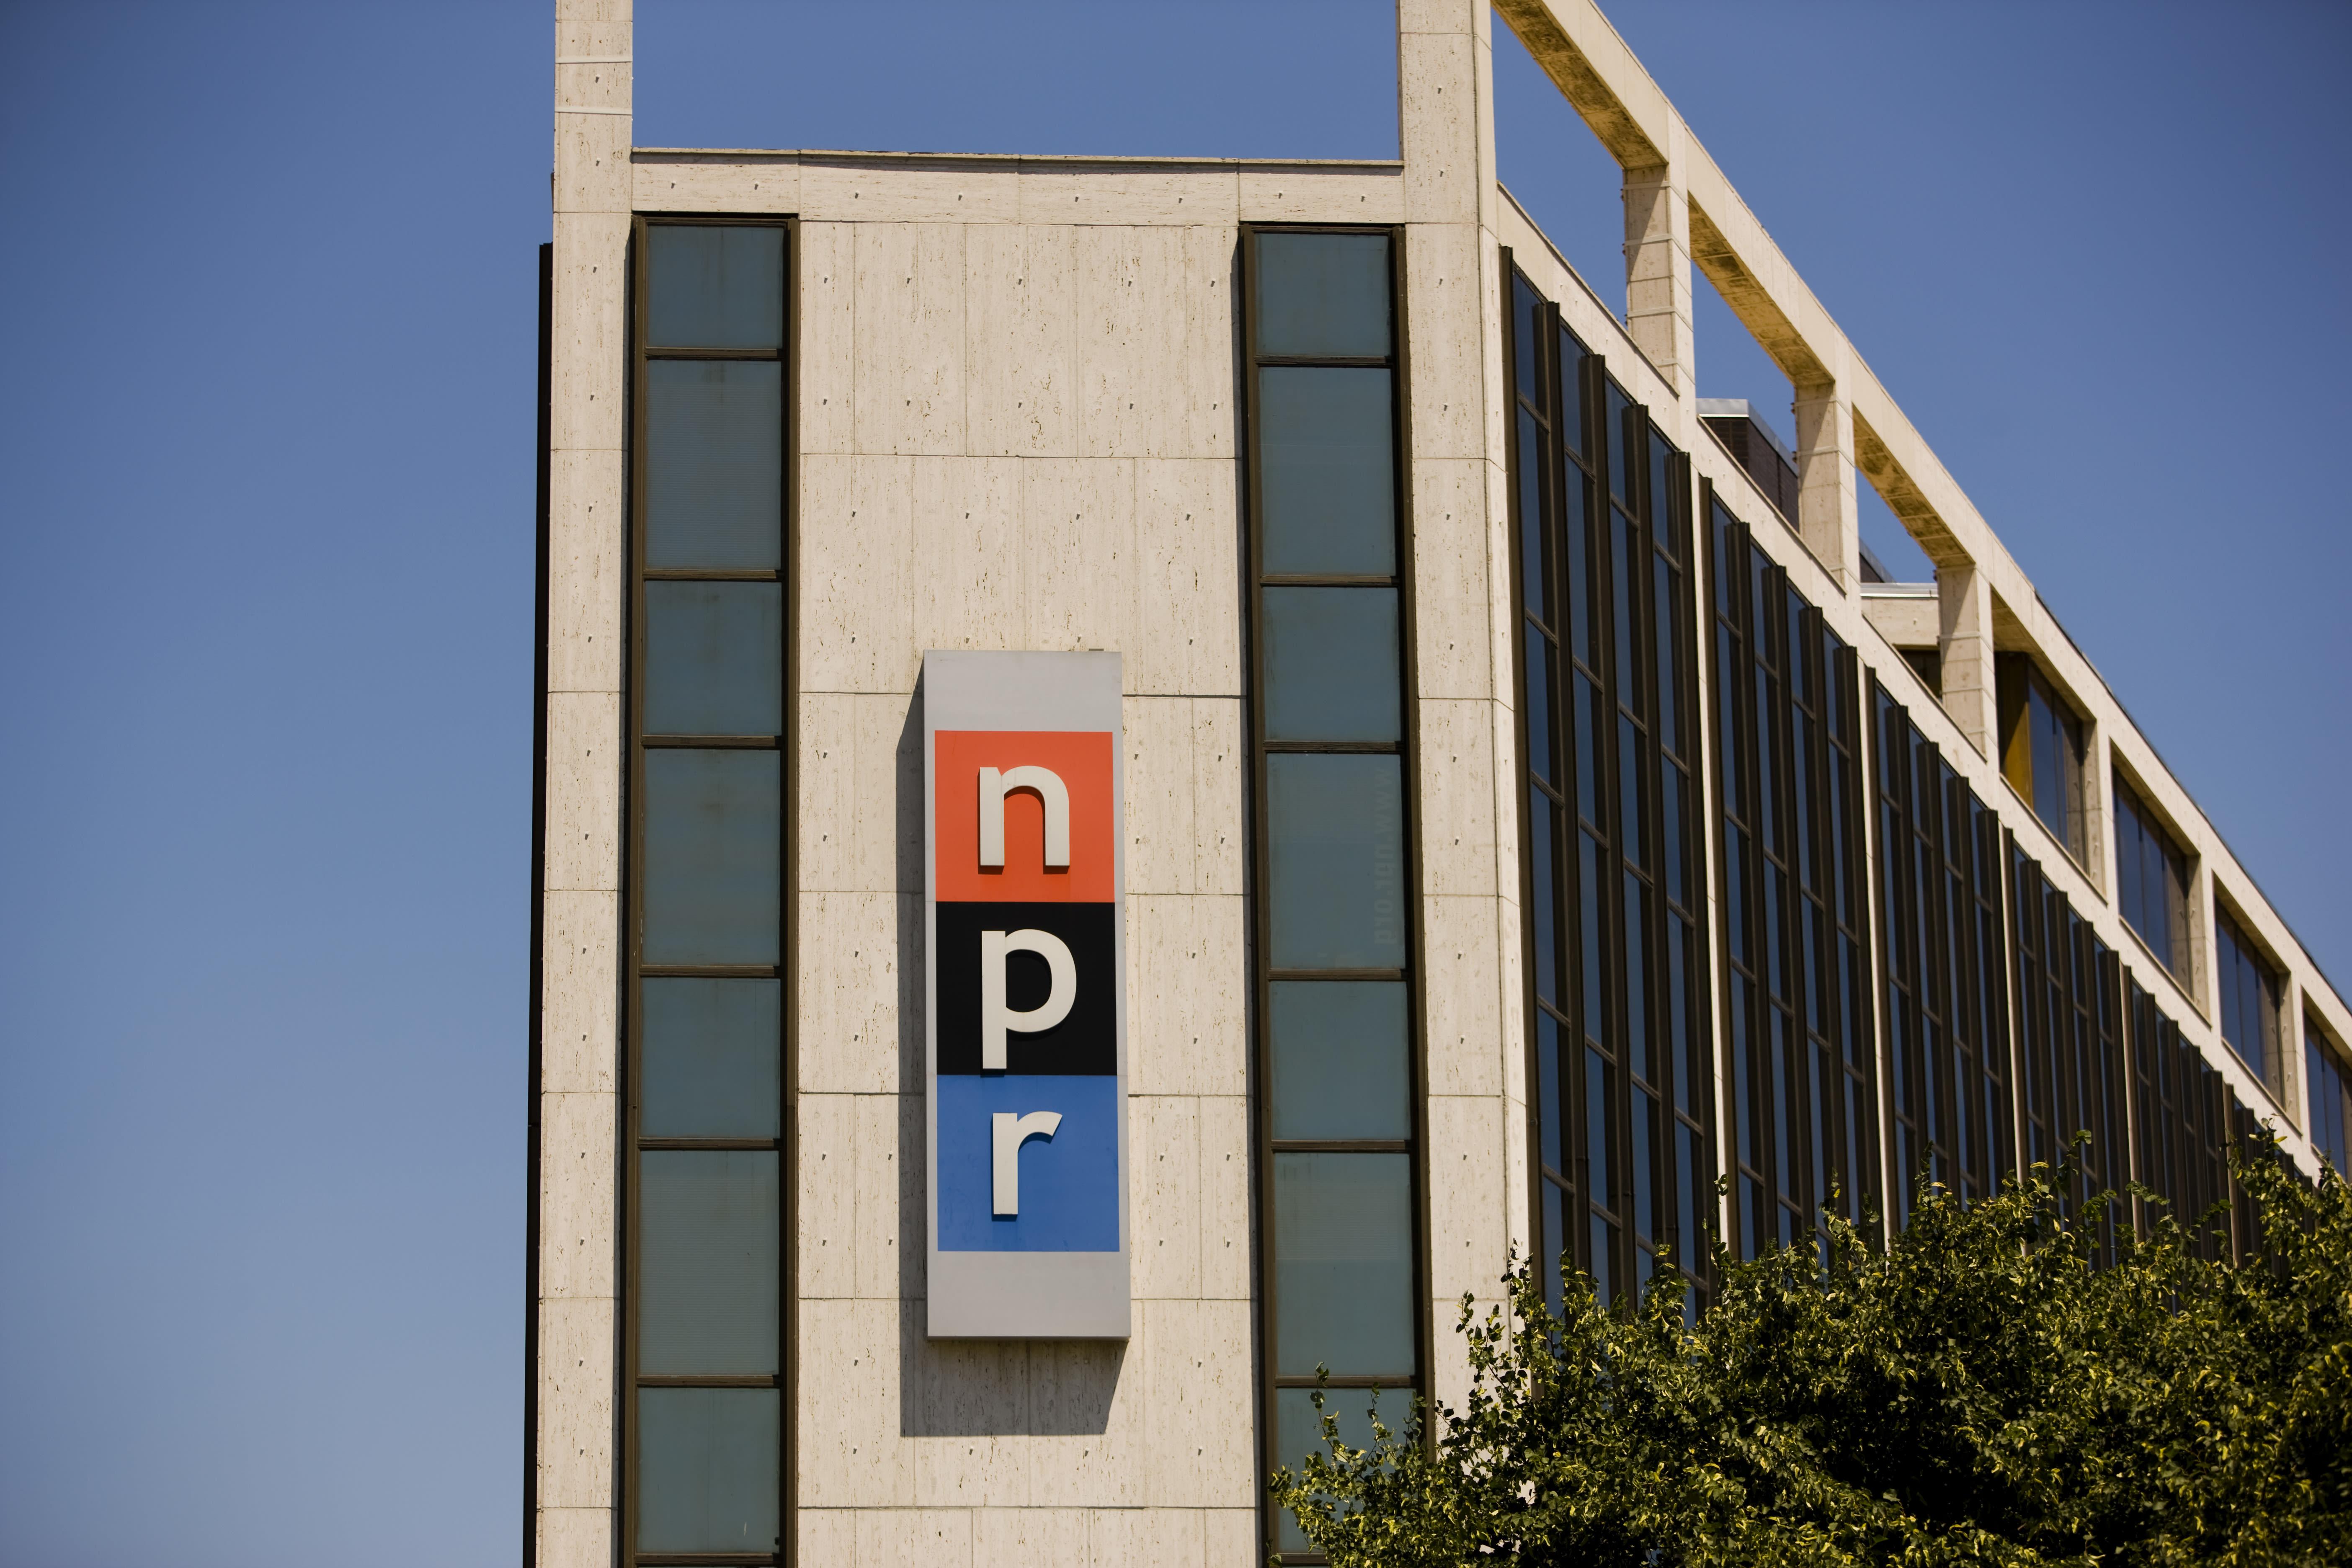 NPR building in Washington, DC